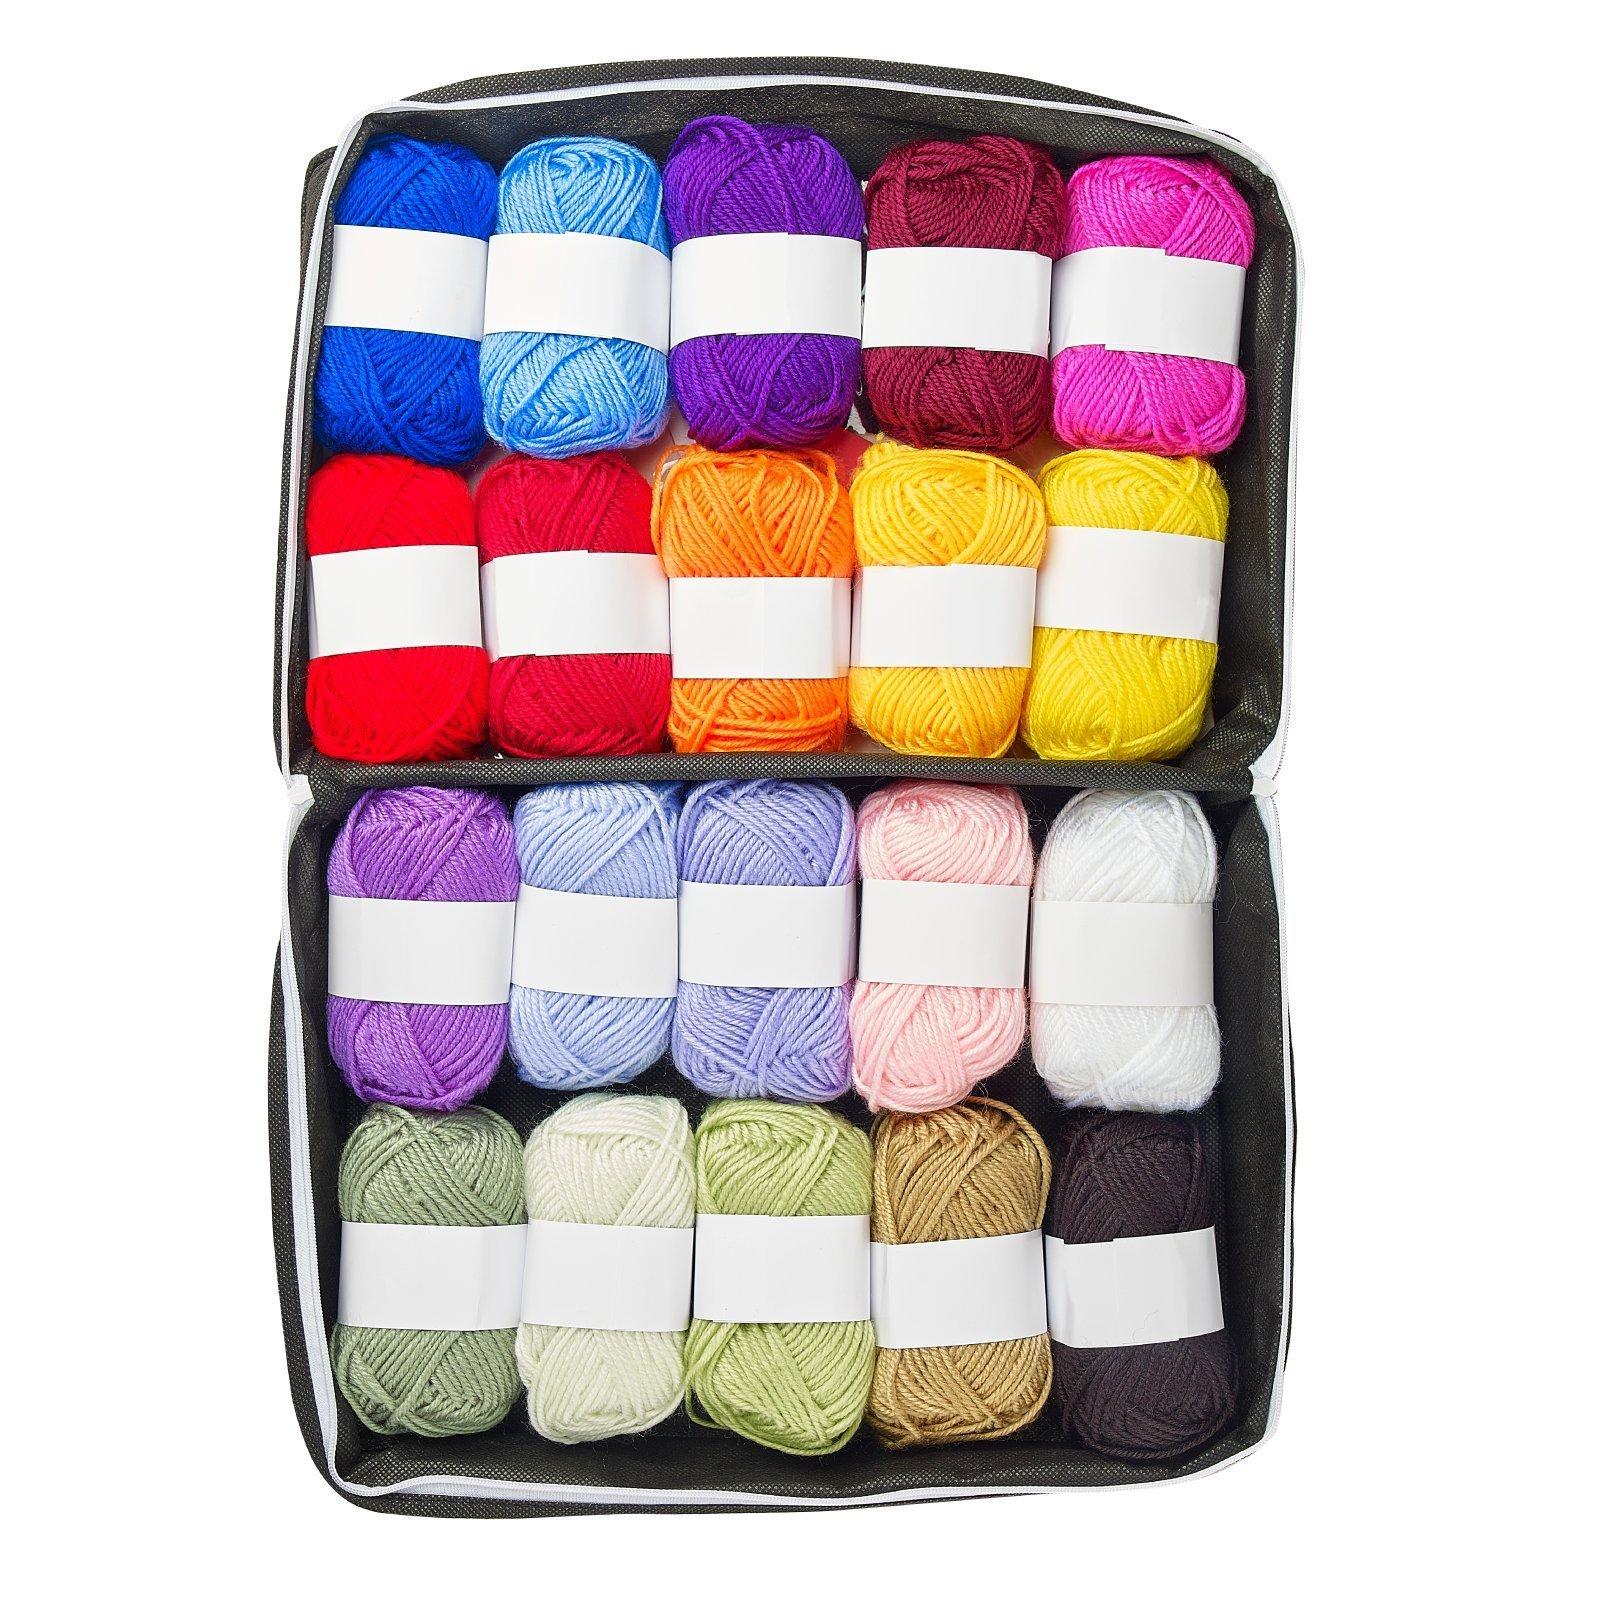 Mind My Thread 20 Super Soft Acrylic Yarn Skeins Set | Assorted Colors Crochet & Knitting Craft Yarn Kit with Reusable Storage Bag & Bonus Crochet Hook | 20 Colors Yarn Multi Pack by Mind My Thread (Image #4)